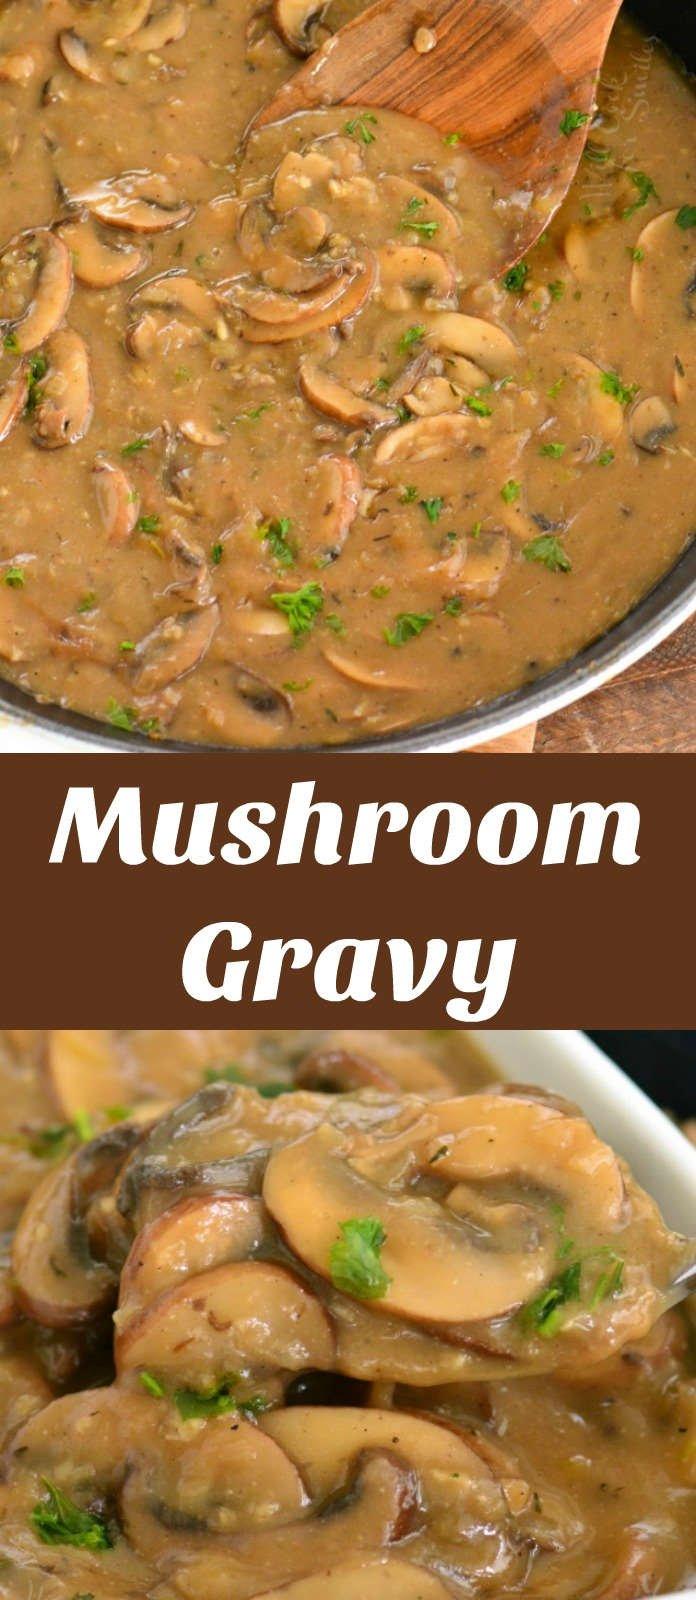 mushroom gravy collage